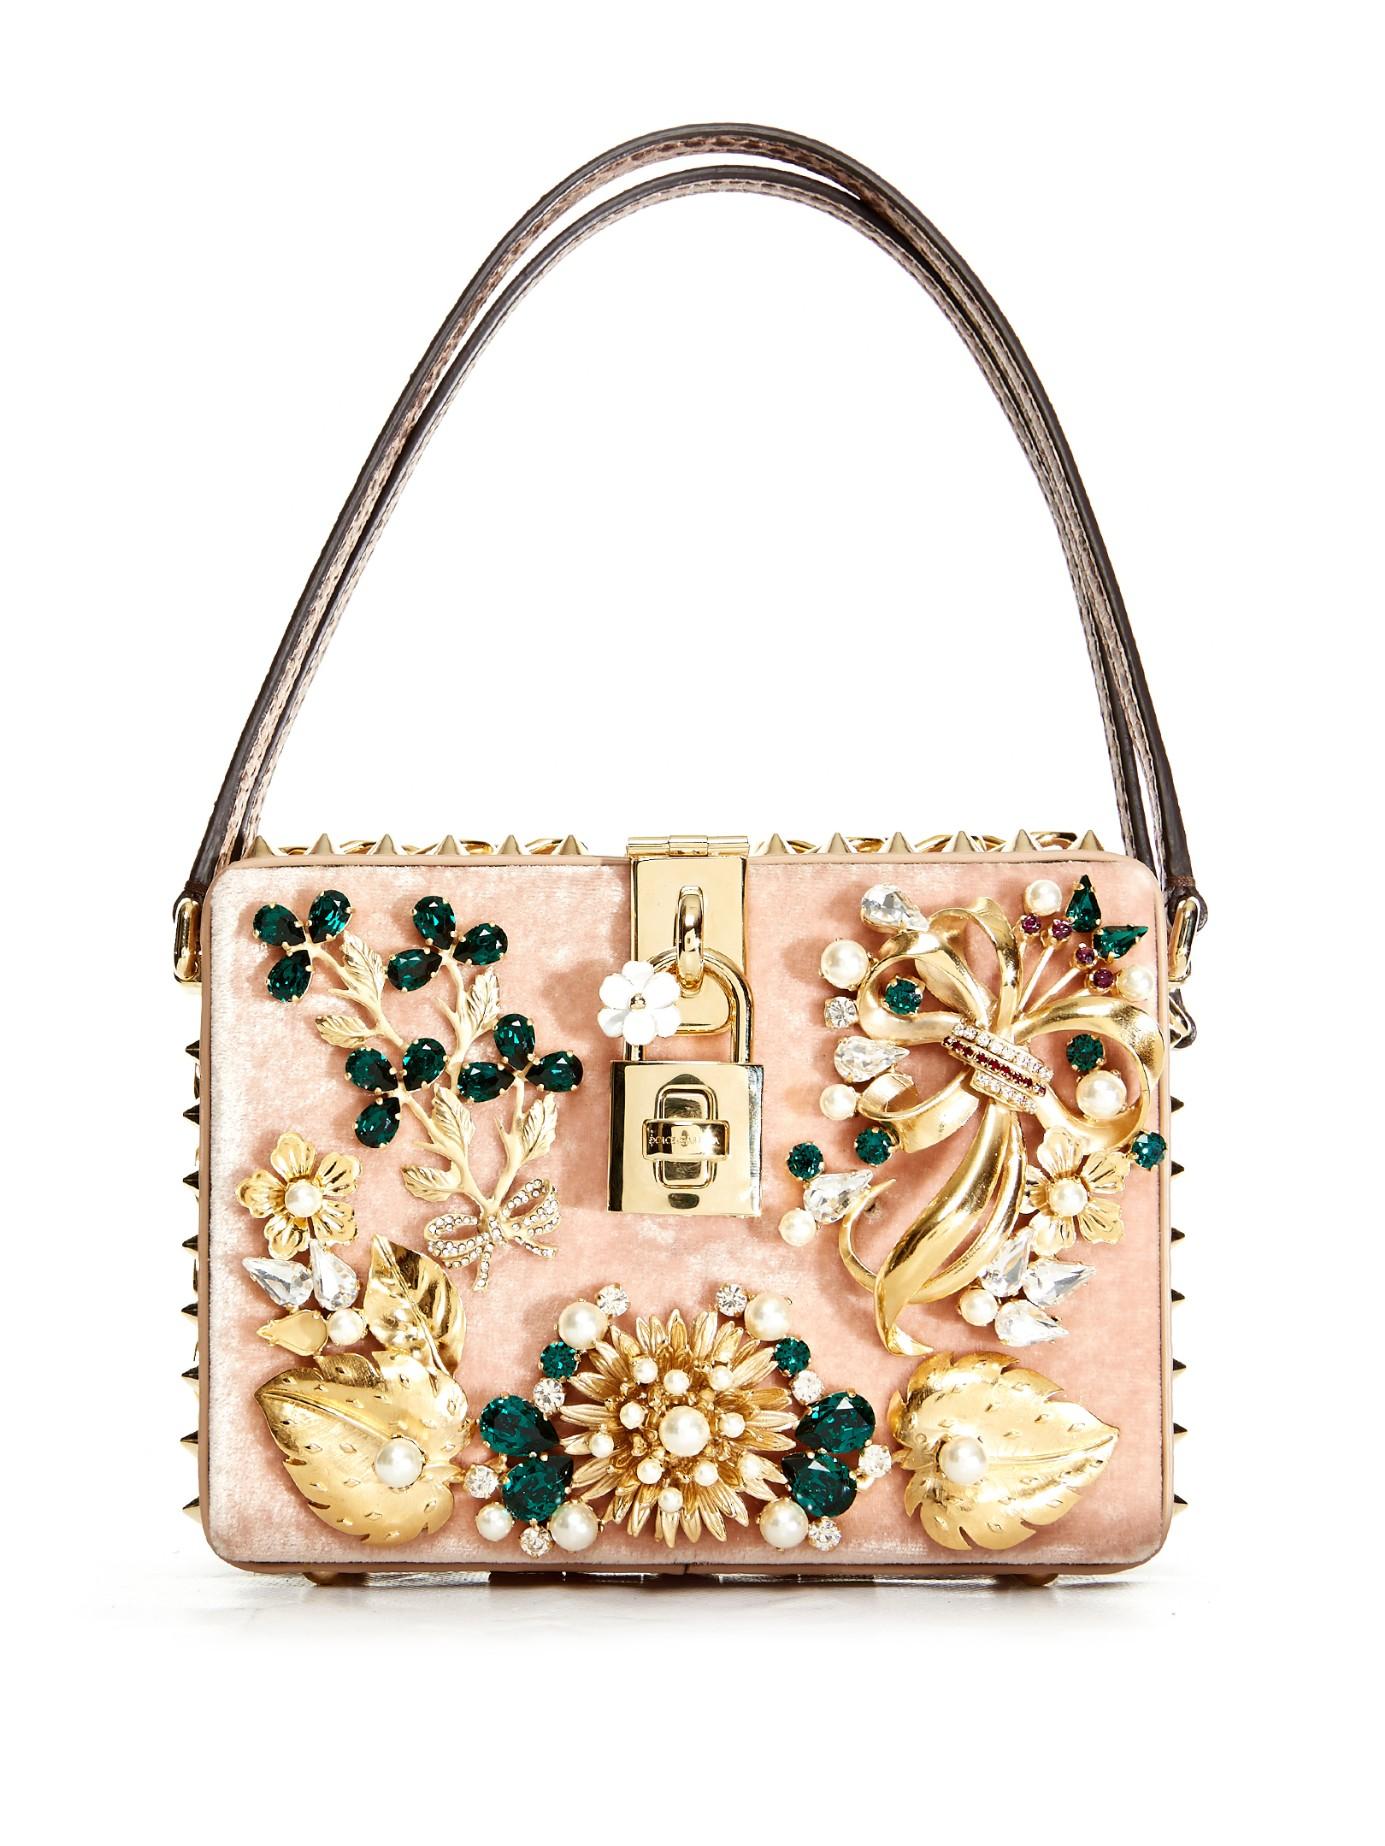 9a32e2c33a47 Lyst - Dolce   Gabbana Dolce Mama Embellished Box Bag